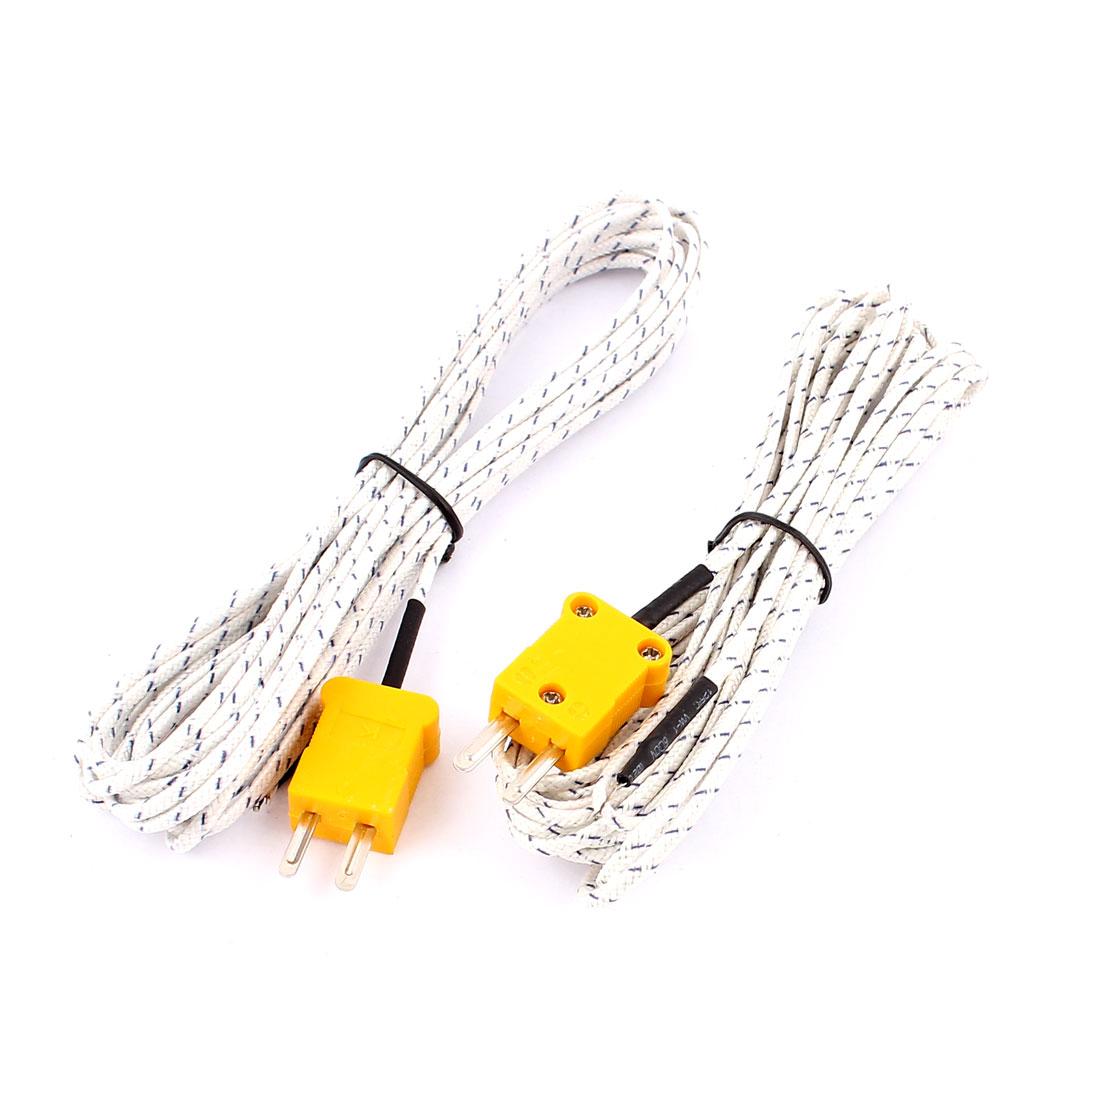 TP-01 K Type Thermocouple Temperature Measurement Probe Sensor Cable Cord 500cm 16Ft Long 2pcs